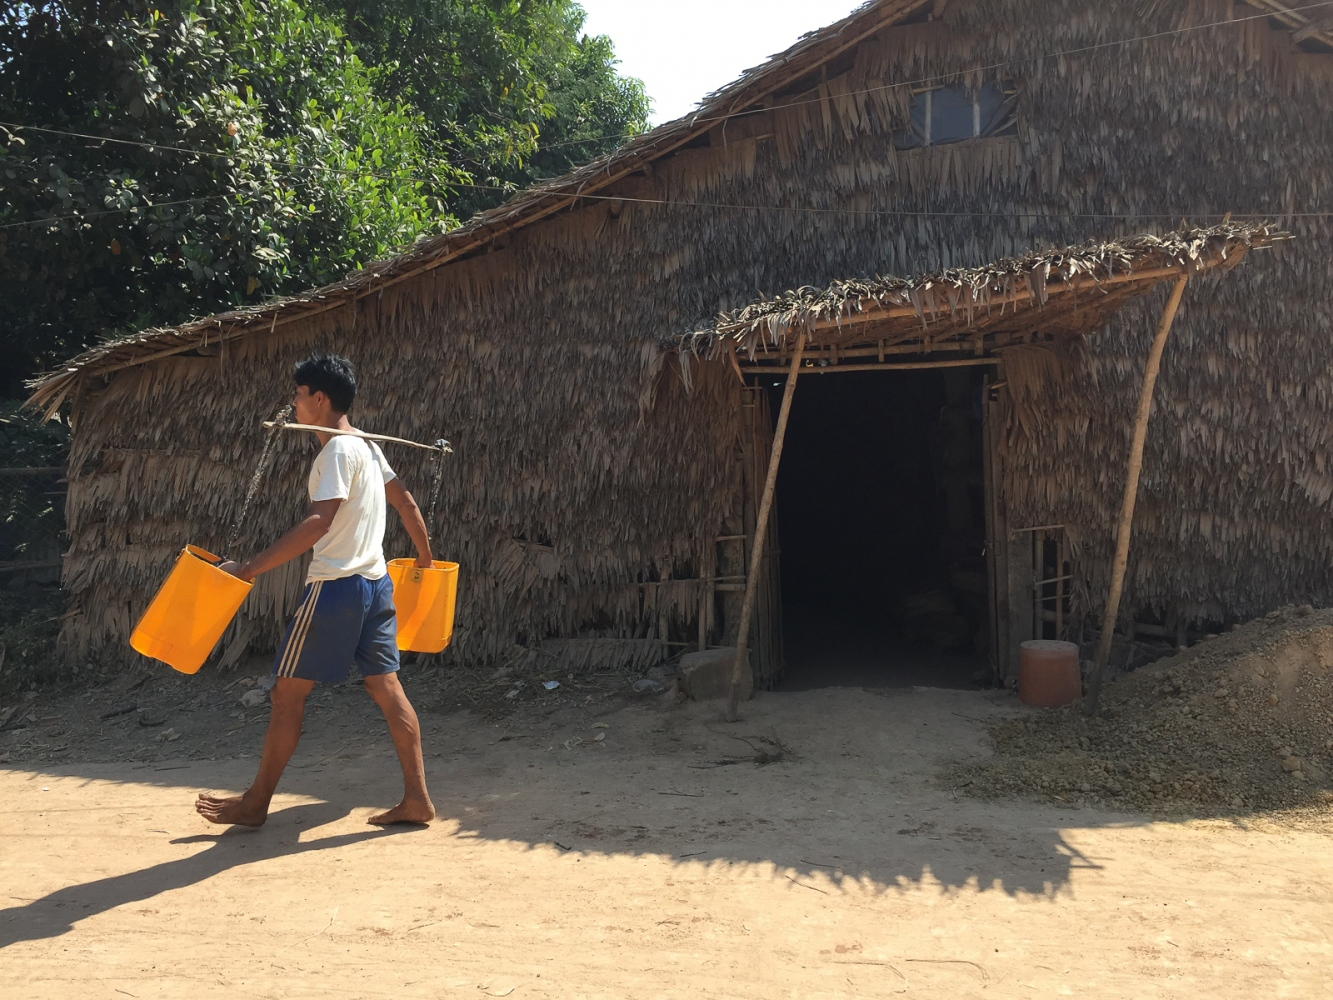 Art and Documentary Photography - Loading 20150205_Burma_2015_0019.jpg